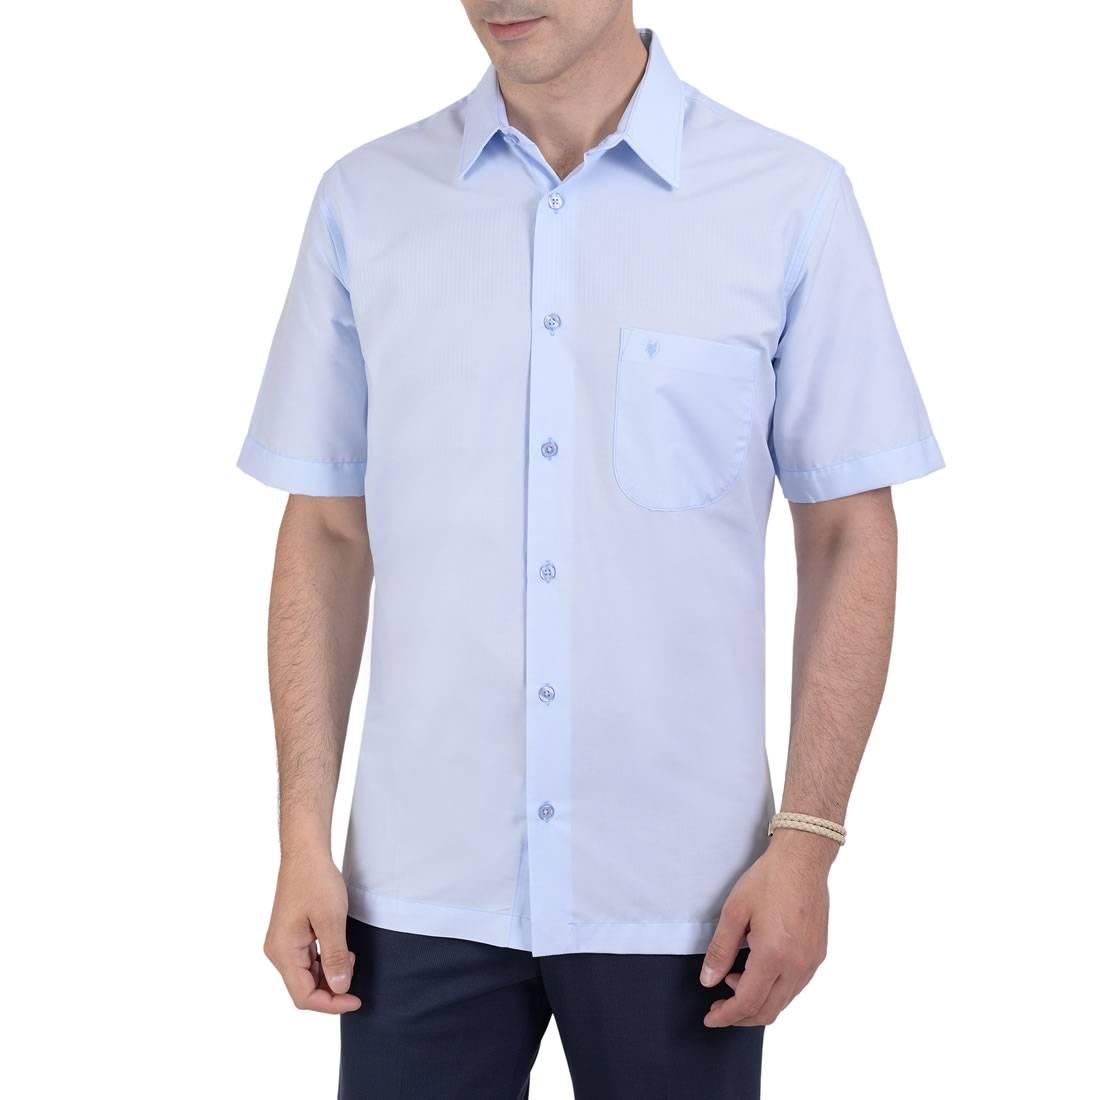 042379432110-01-Camisa-Casual-Manga-Corta-Classic-Fit-Azul-yale